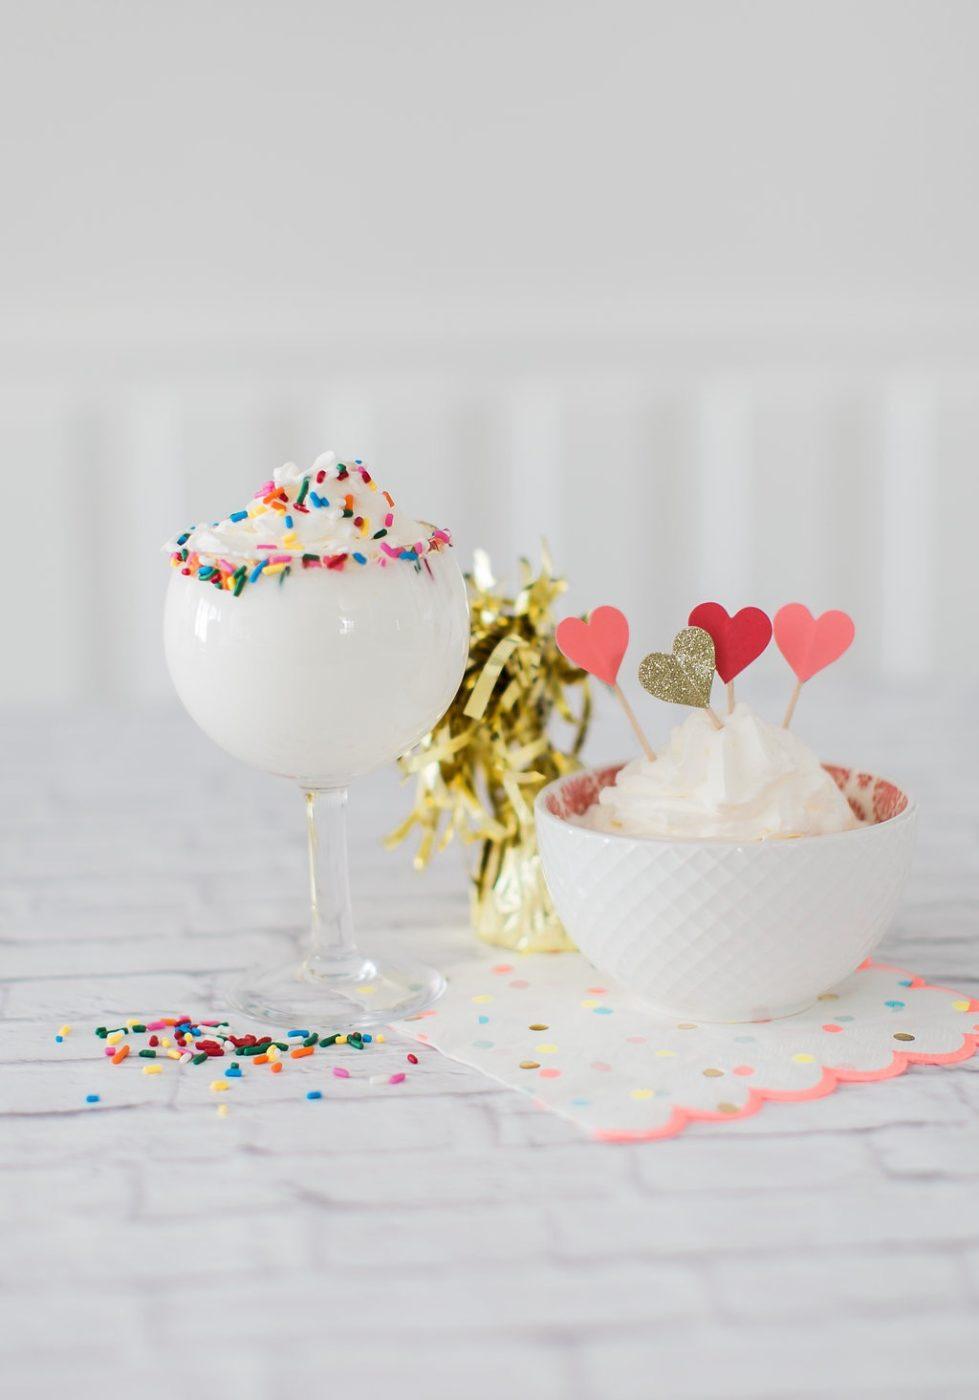 Birthday Cake Cocktail! Introducing Ali Luvs Happy Hour!